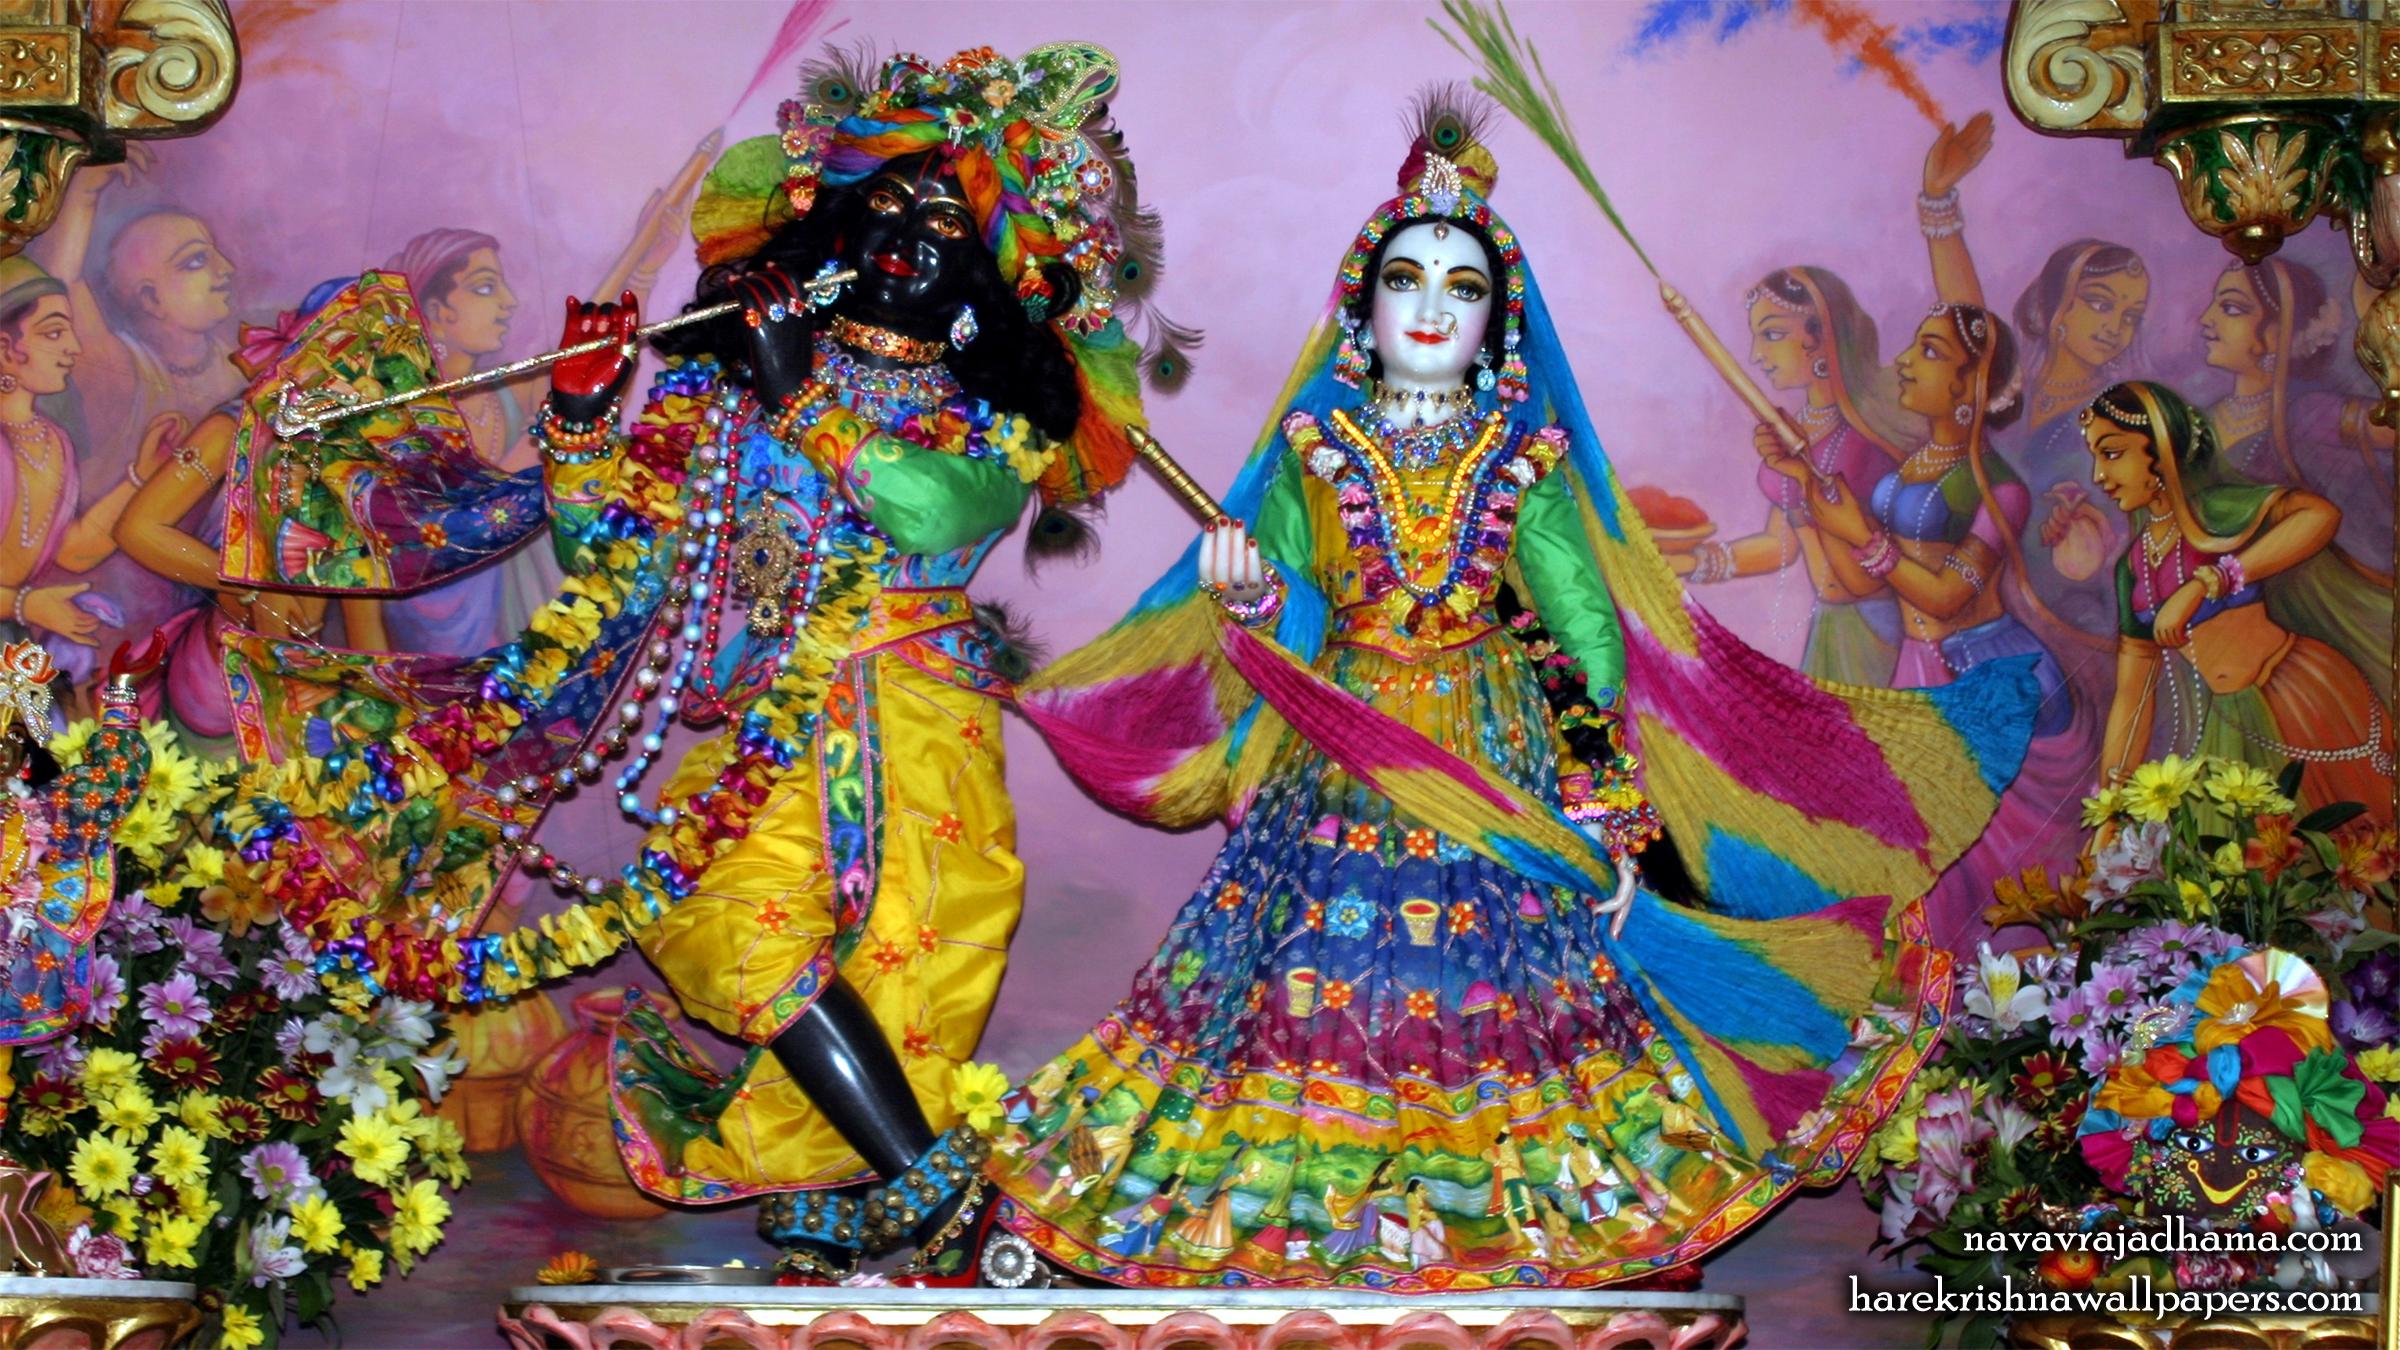 Sri Sri Radha Shyamsundar Wallpaper (026) Size 2400x1350 Download